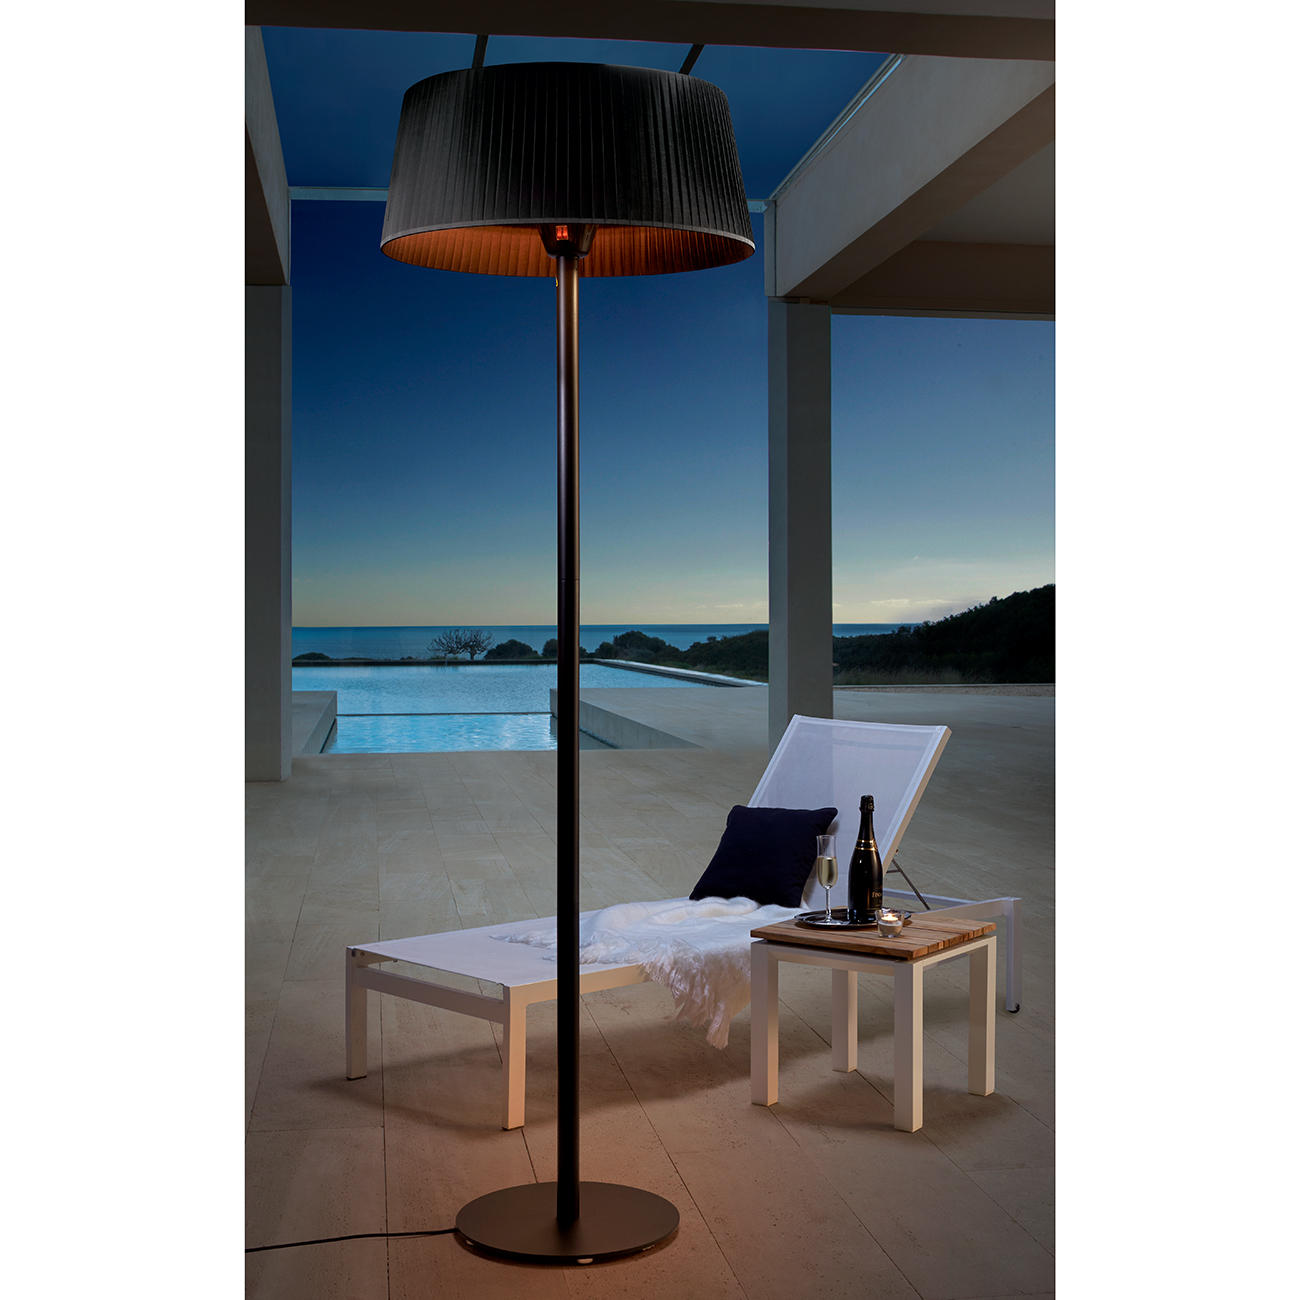 design heizstrahler stehlampe 360 infrarot halogen heizelement 900 1200 oder 2100 watt. Black Bedroom Furniture Sets. Home Design Ideas